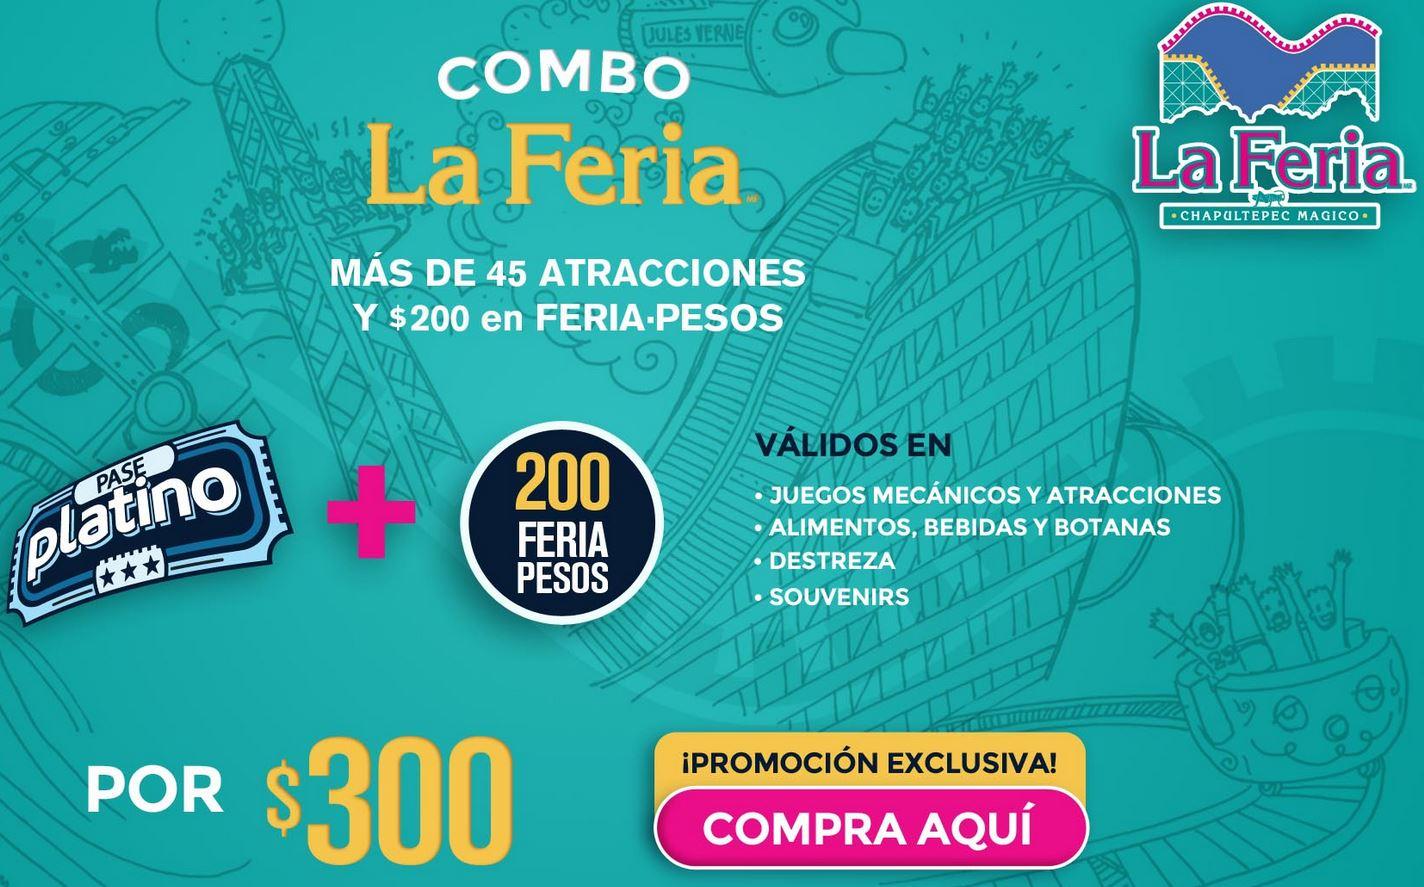 Feria de Chapultepec: Paquete Combo por $300